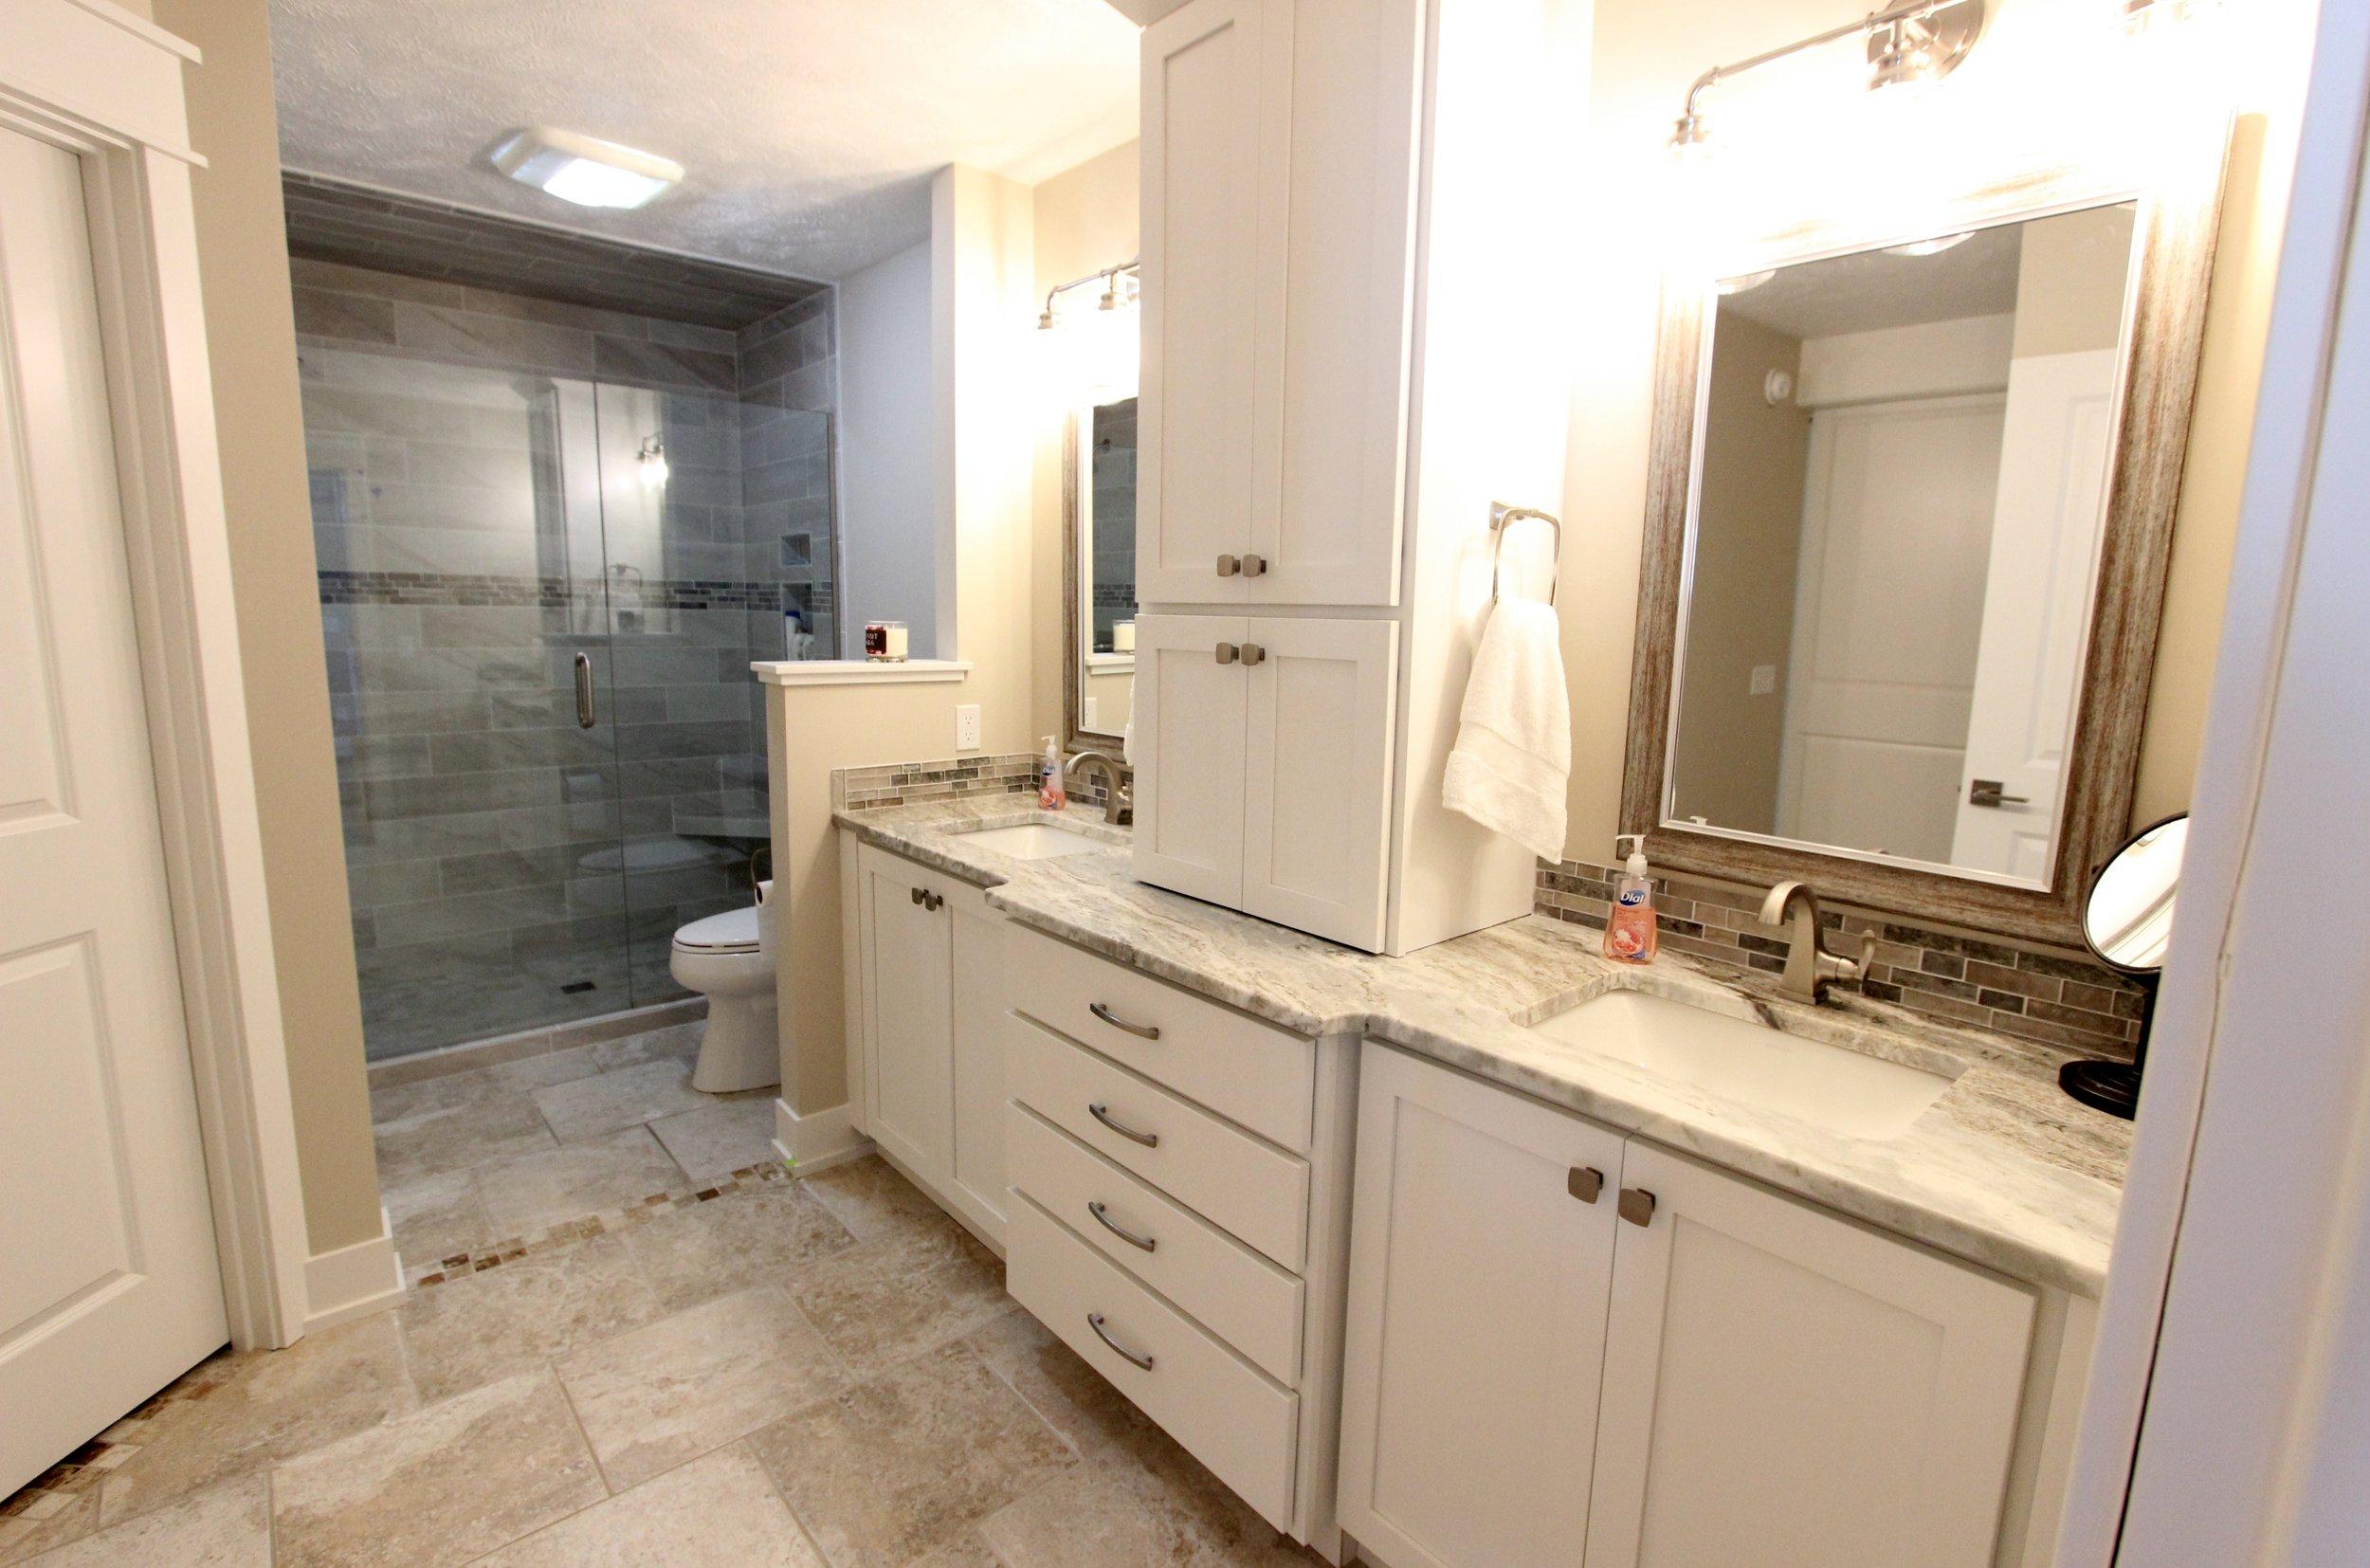 Ortiz bathroom after.JPG